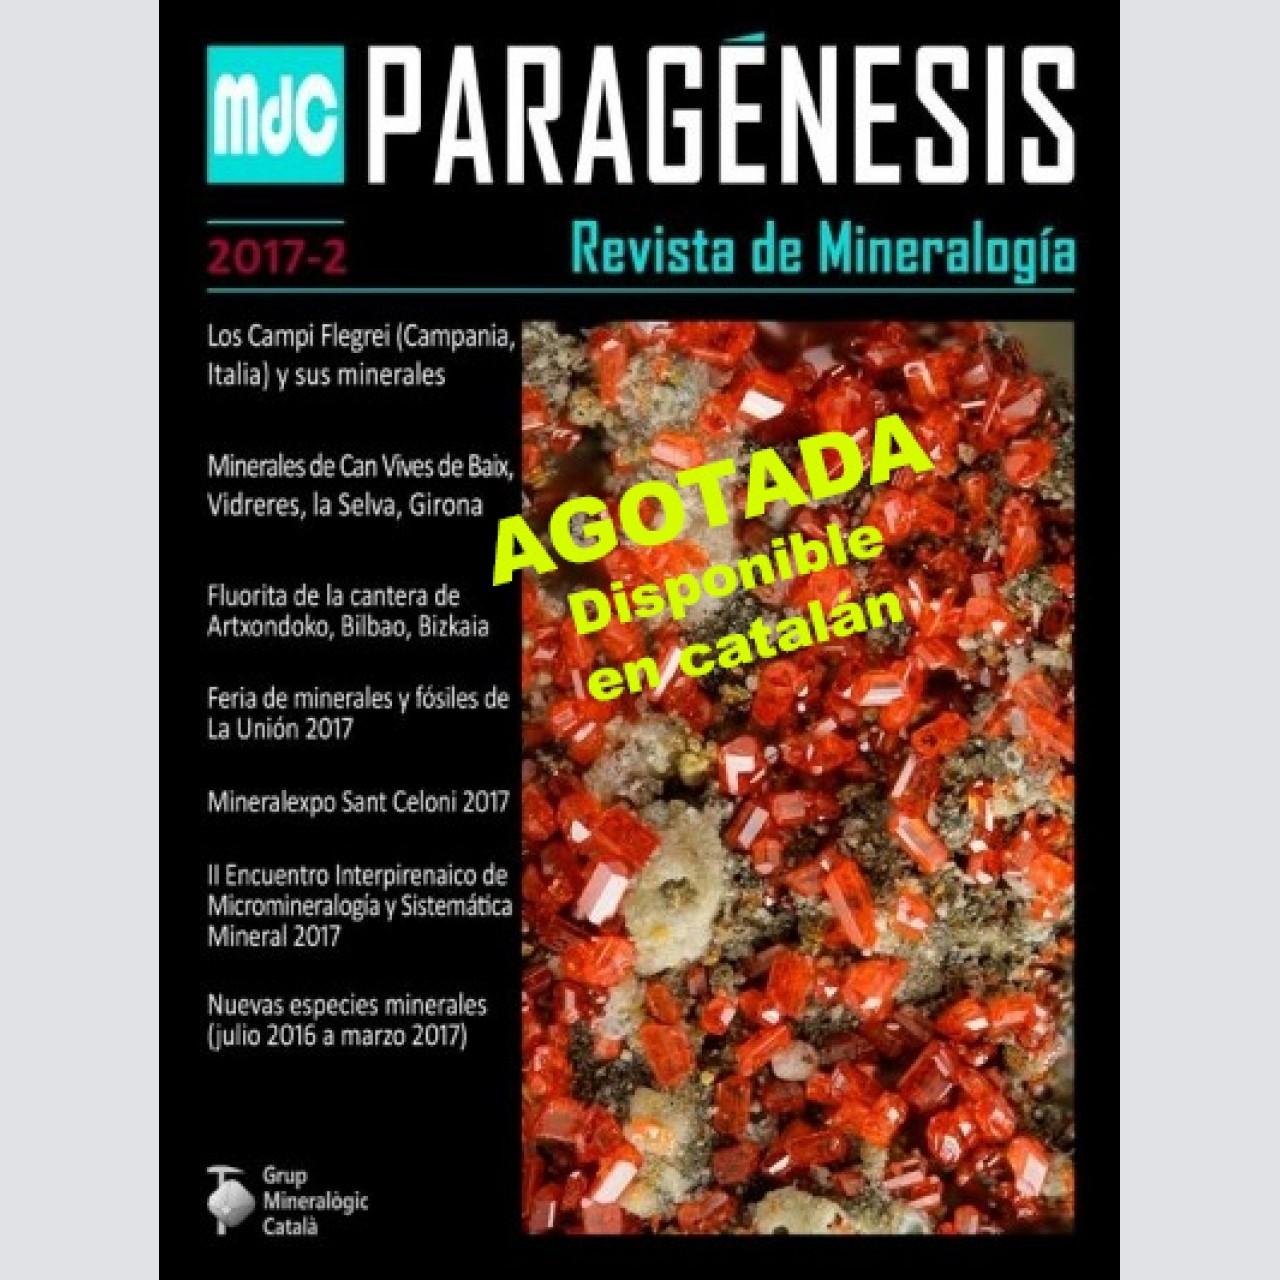 Paragénesis. Revista de Mineralogía (2017-2)